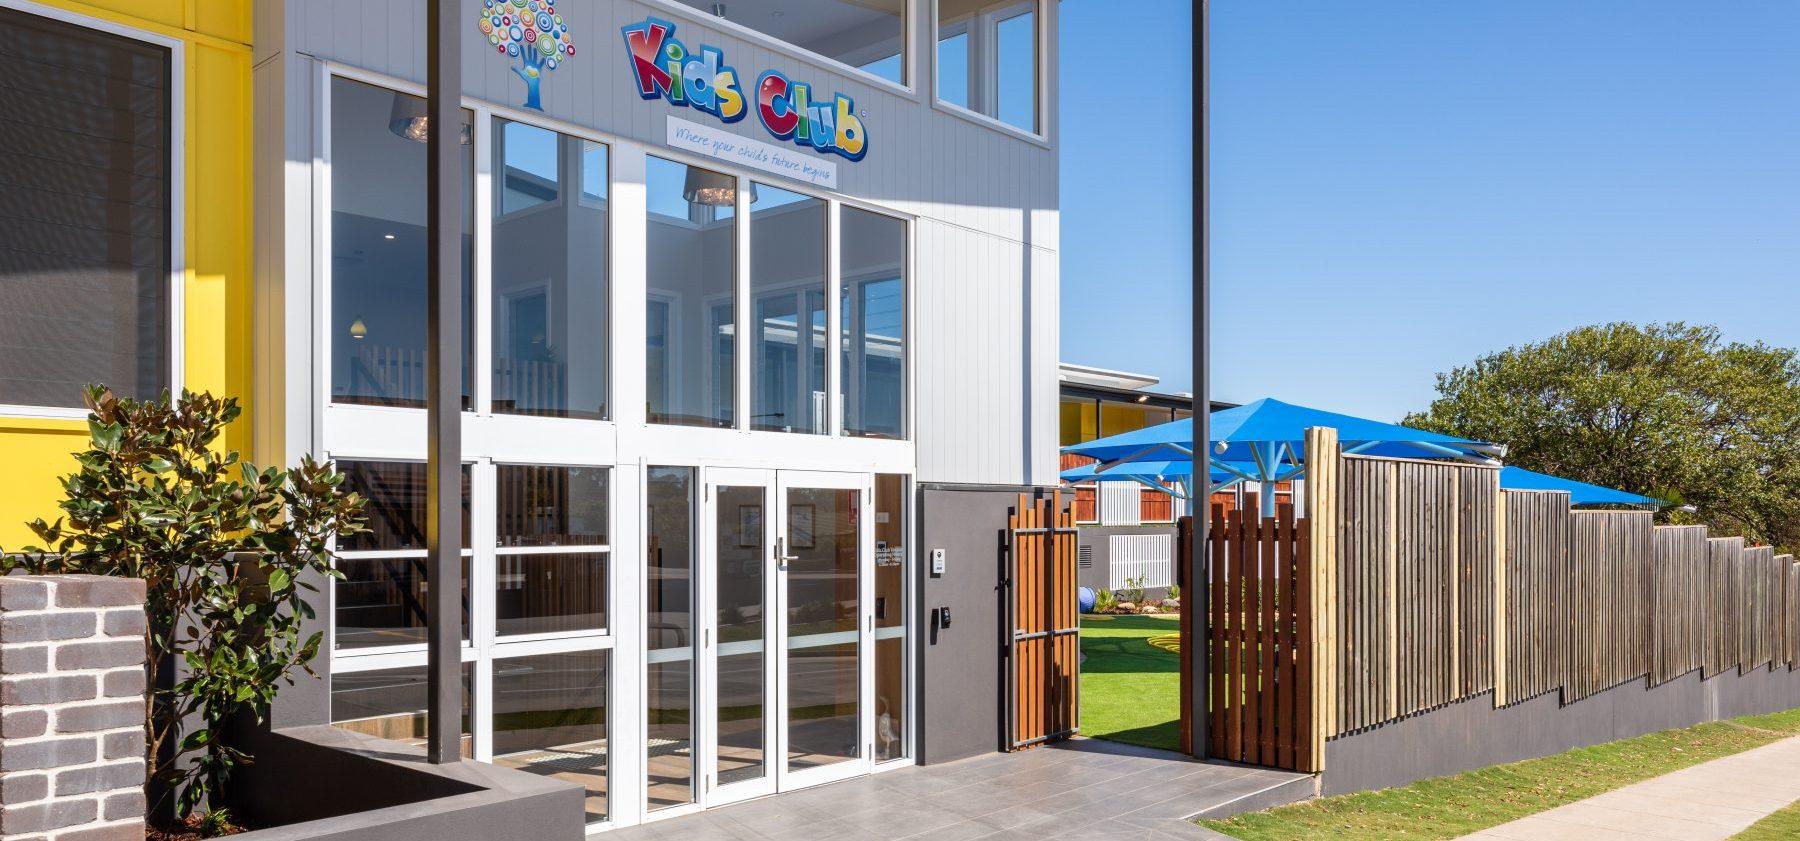 Handford Road Childcare External